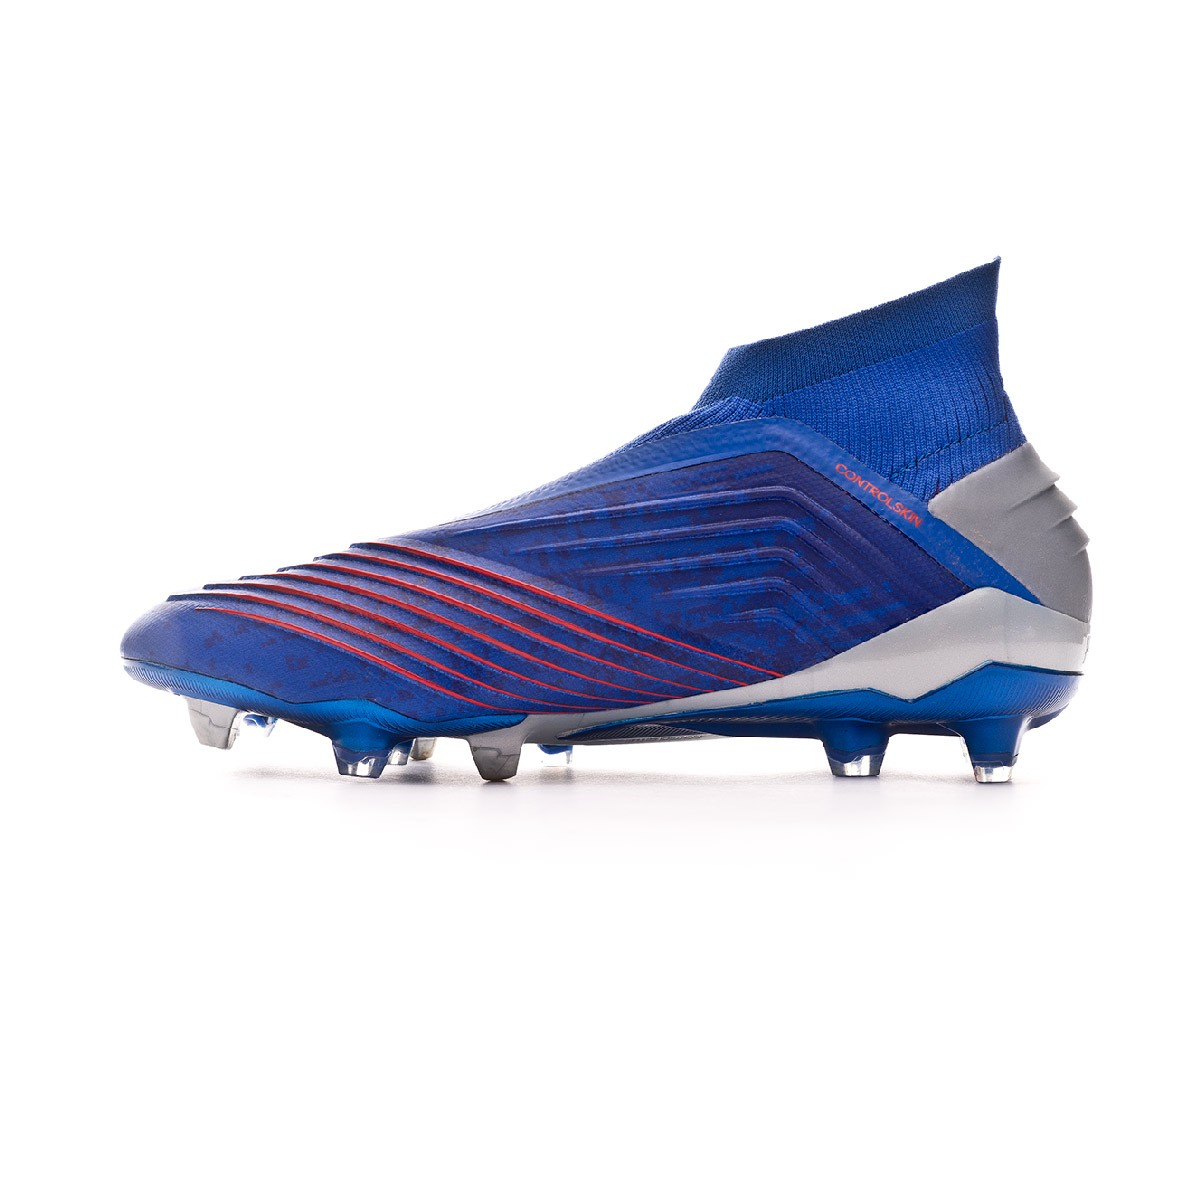 innovative design 6b452 0484b Boot adidas Predator 19+ FG Bold blue-Silver metallic-Active red - Football  store Fútbol Emotion